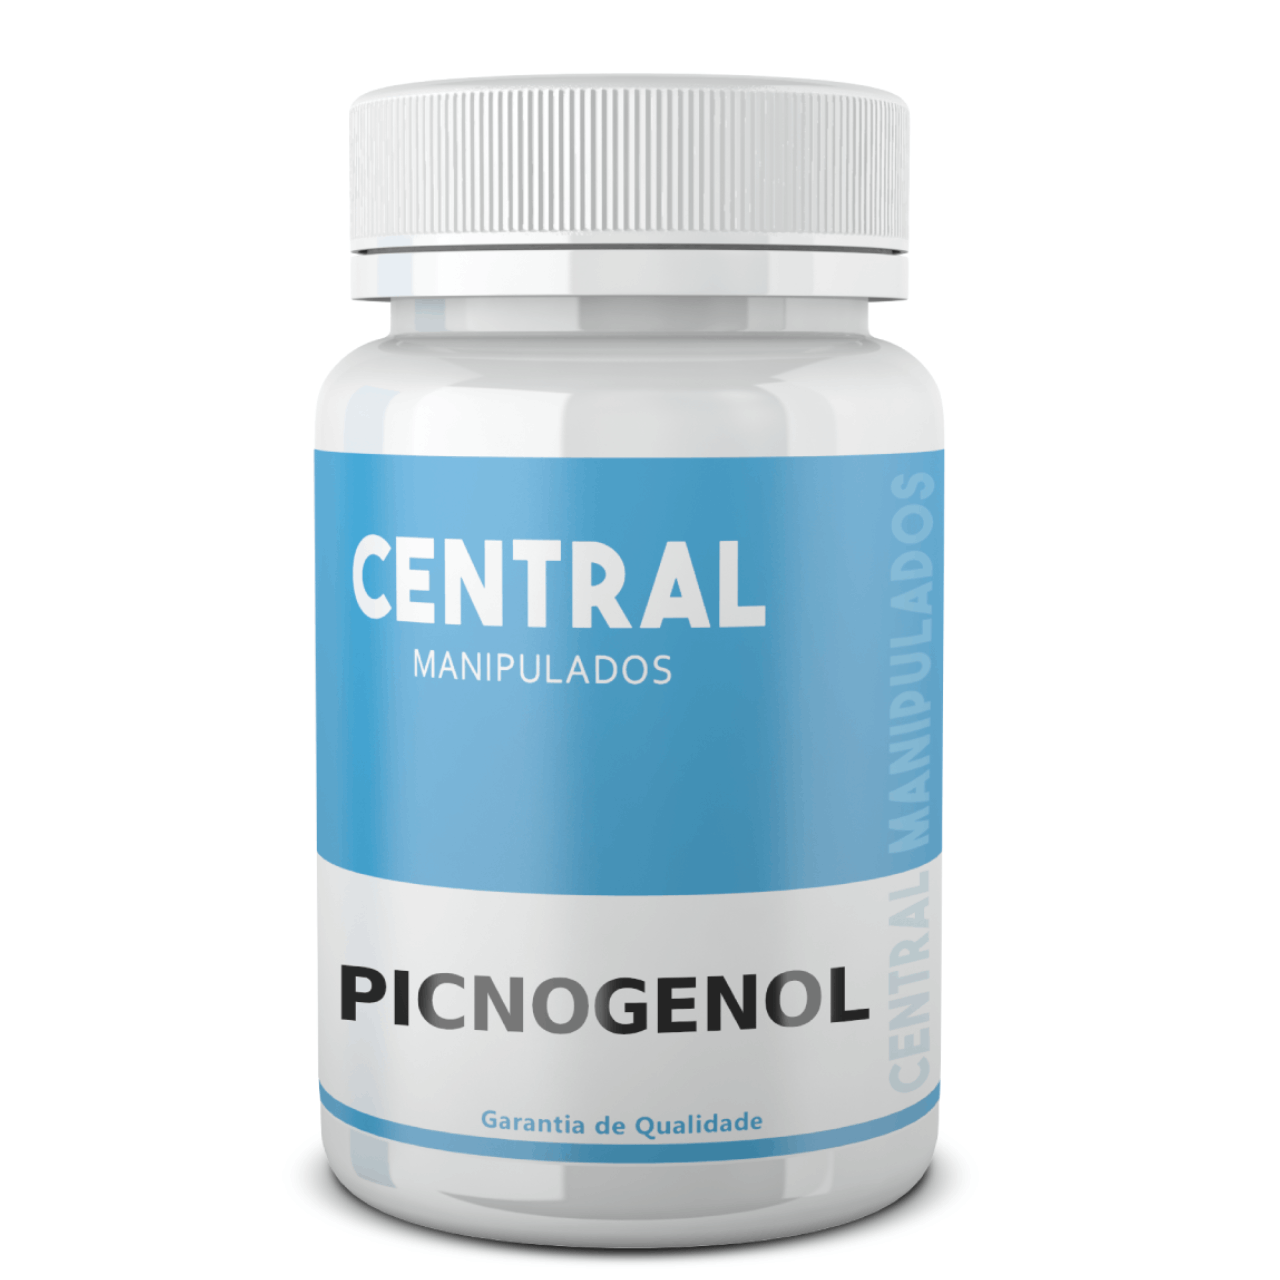 Picnogenol 300mg - 60 cápsulas - (pinus Pinaster) Pycnogenol - ANTIOXIDANTE